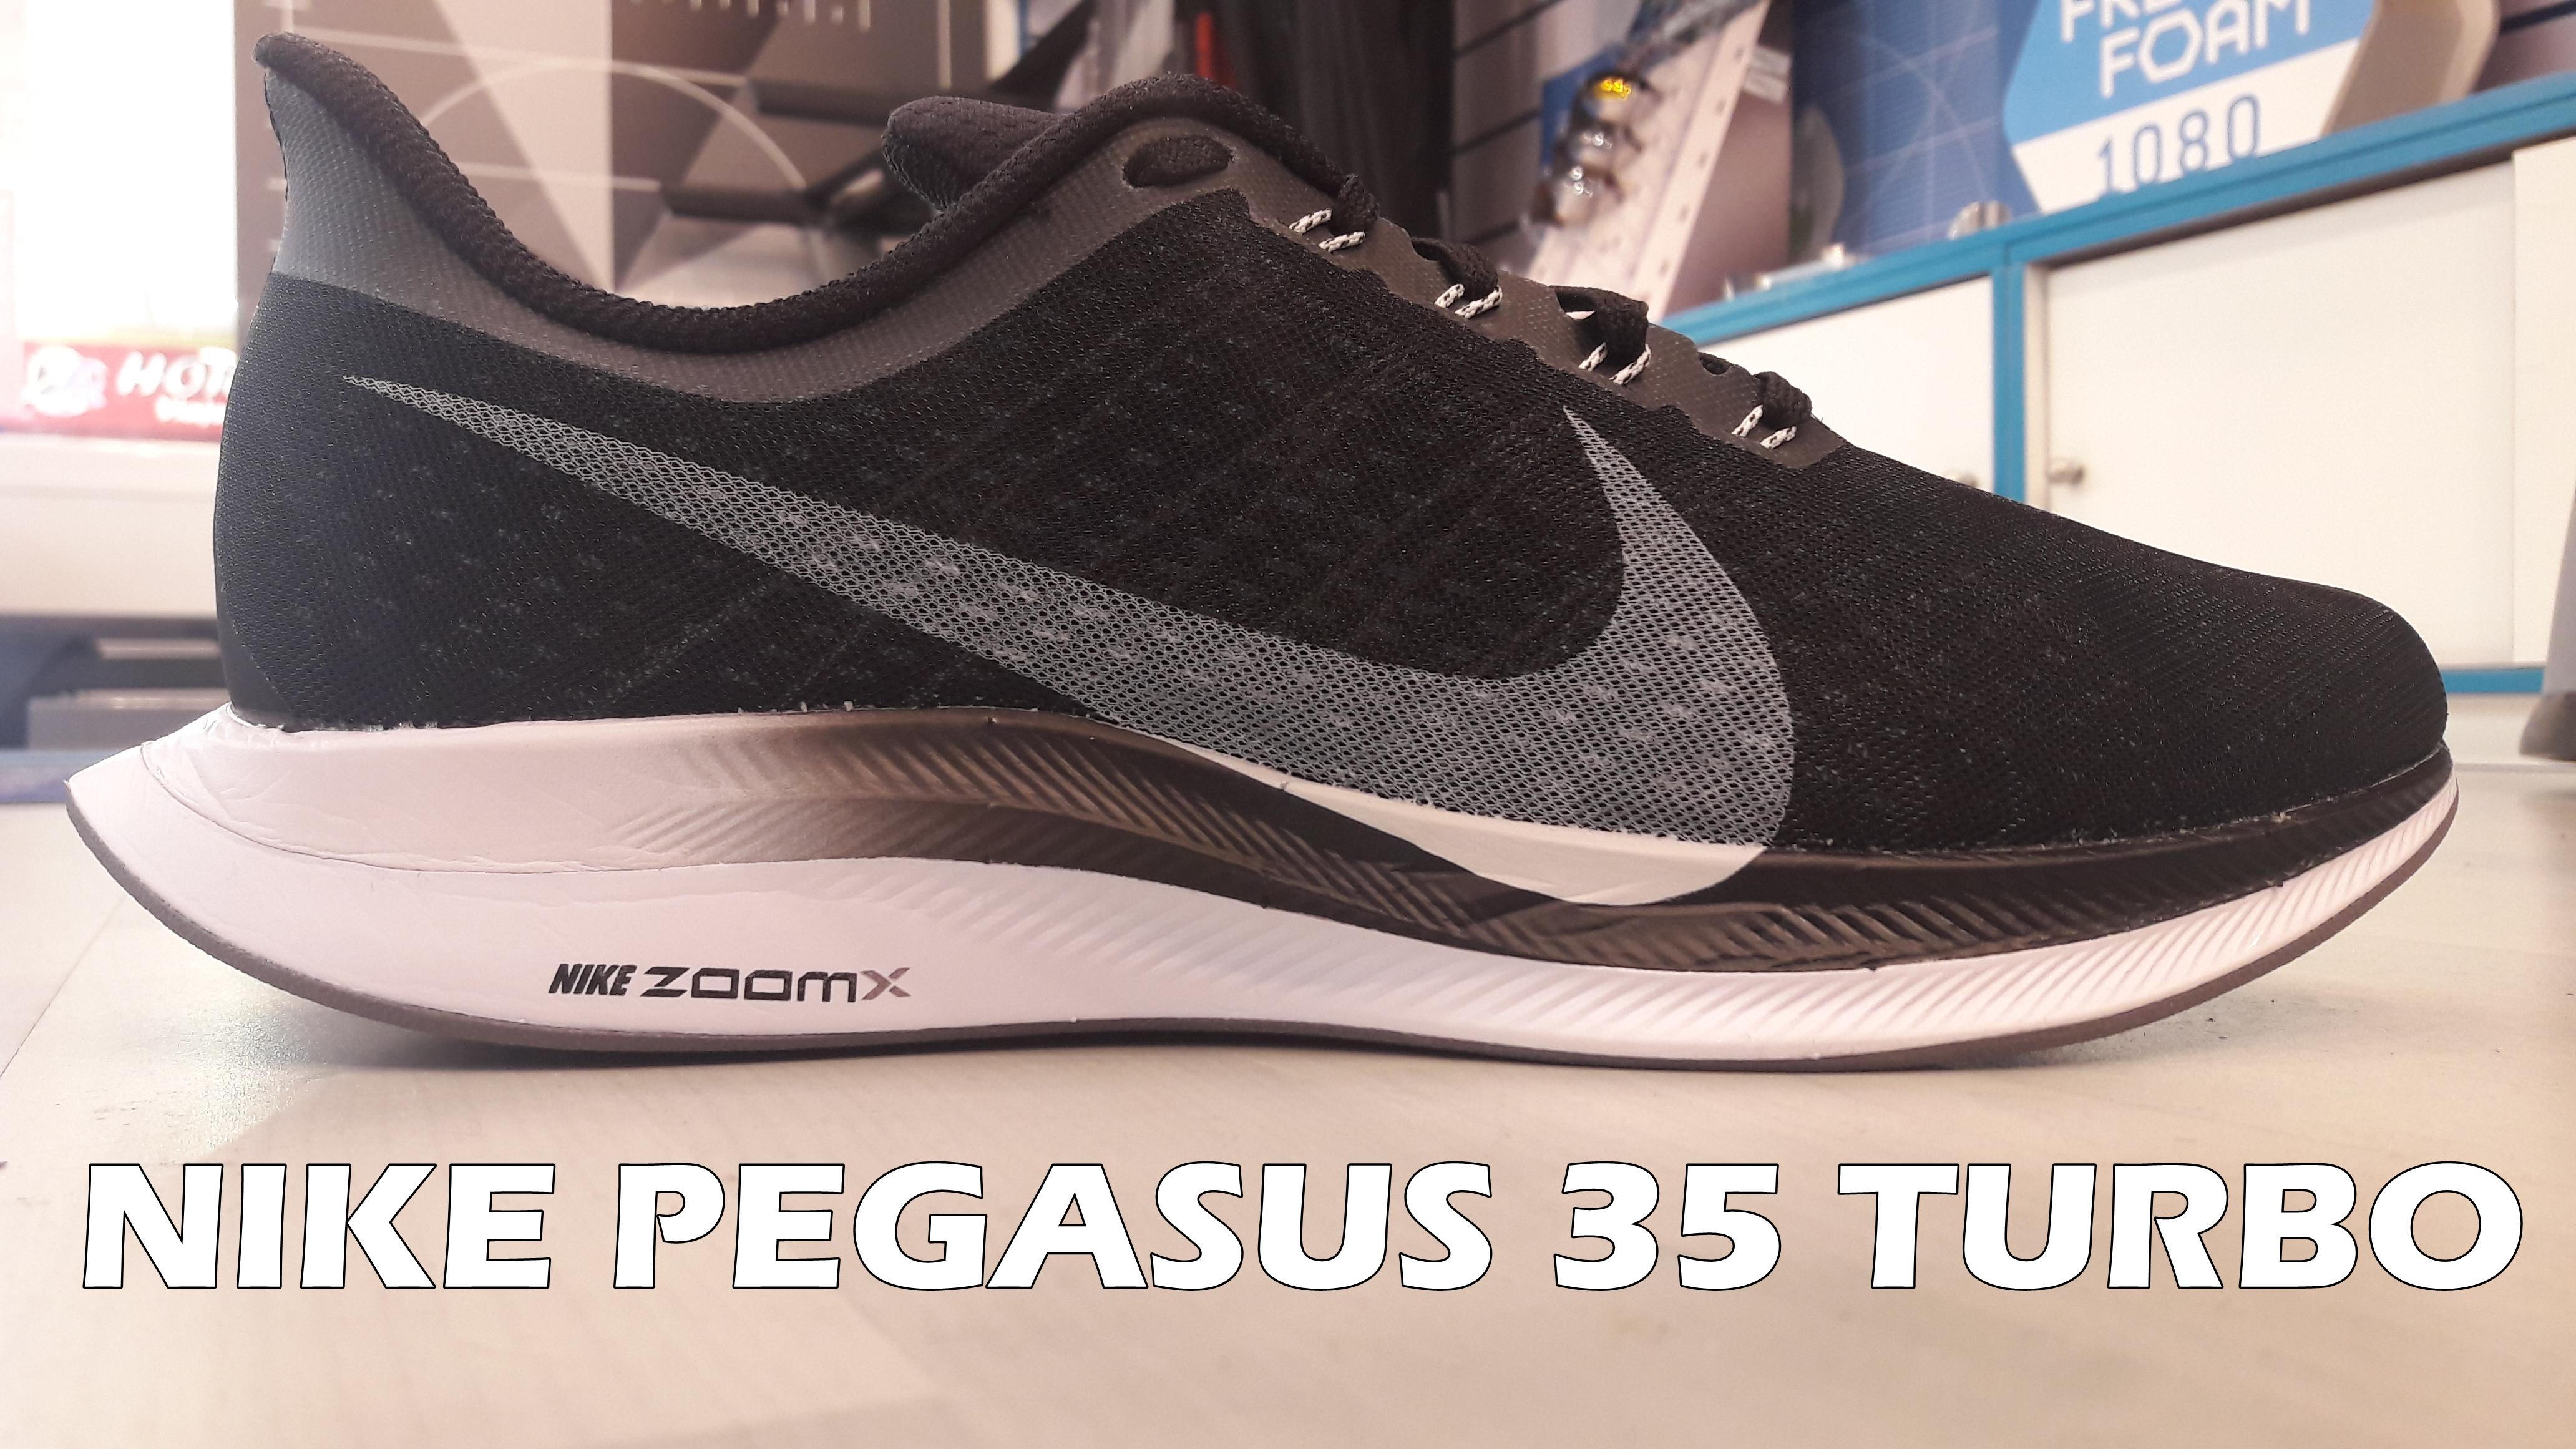 Nike Pegsus 35 turbo